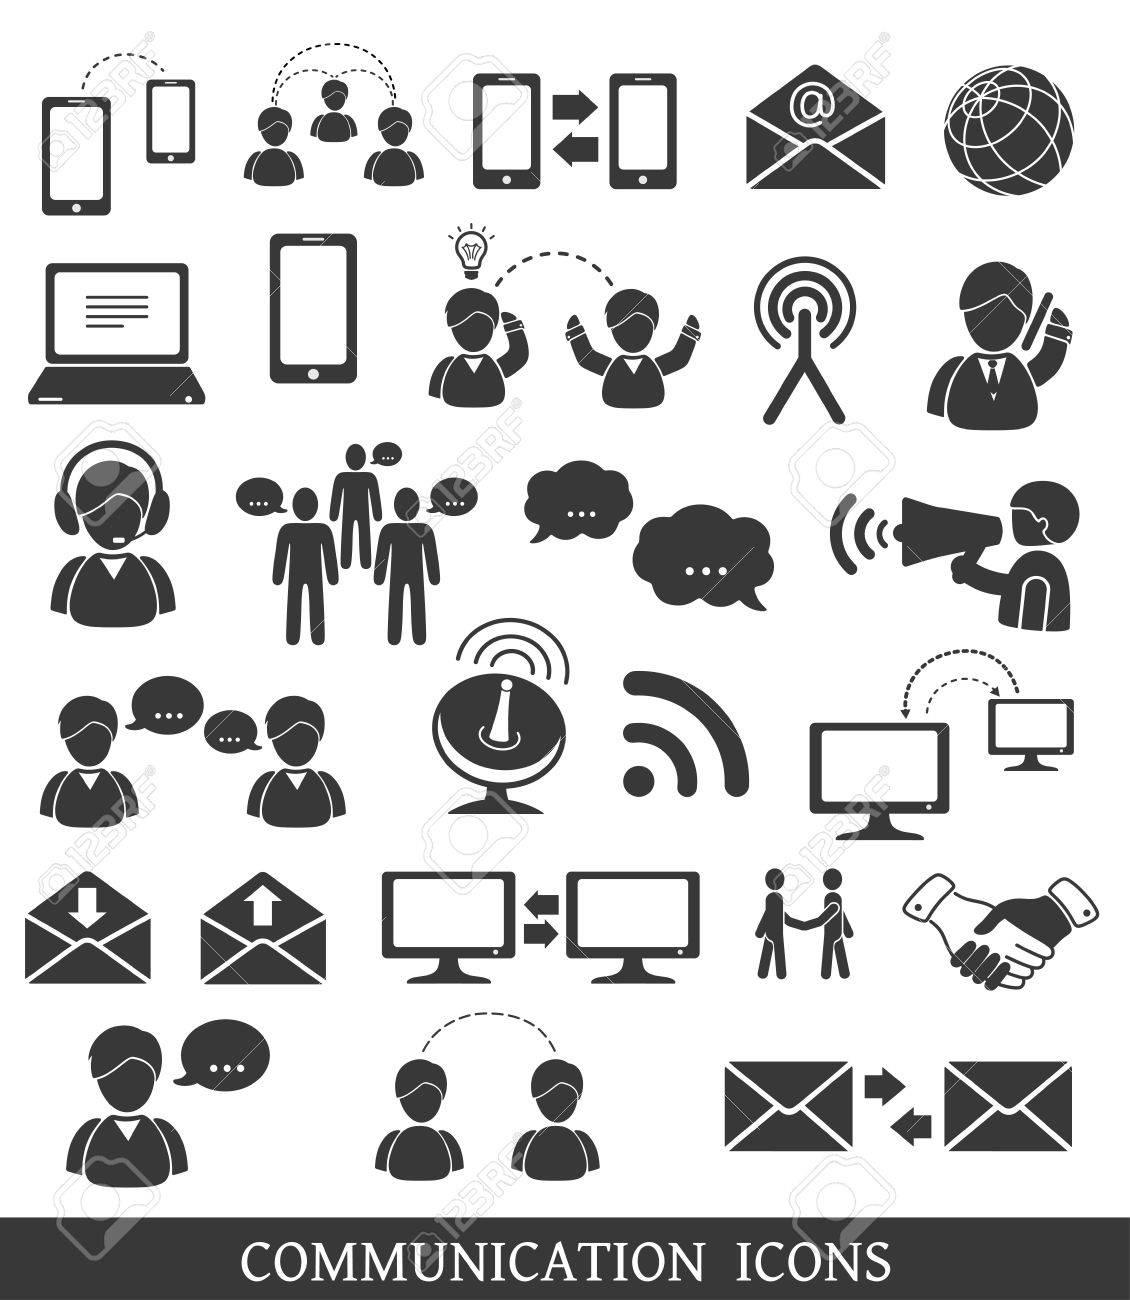 Pictogramme communication